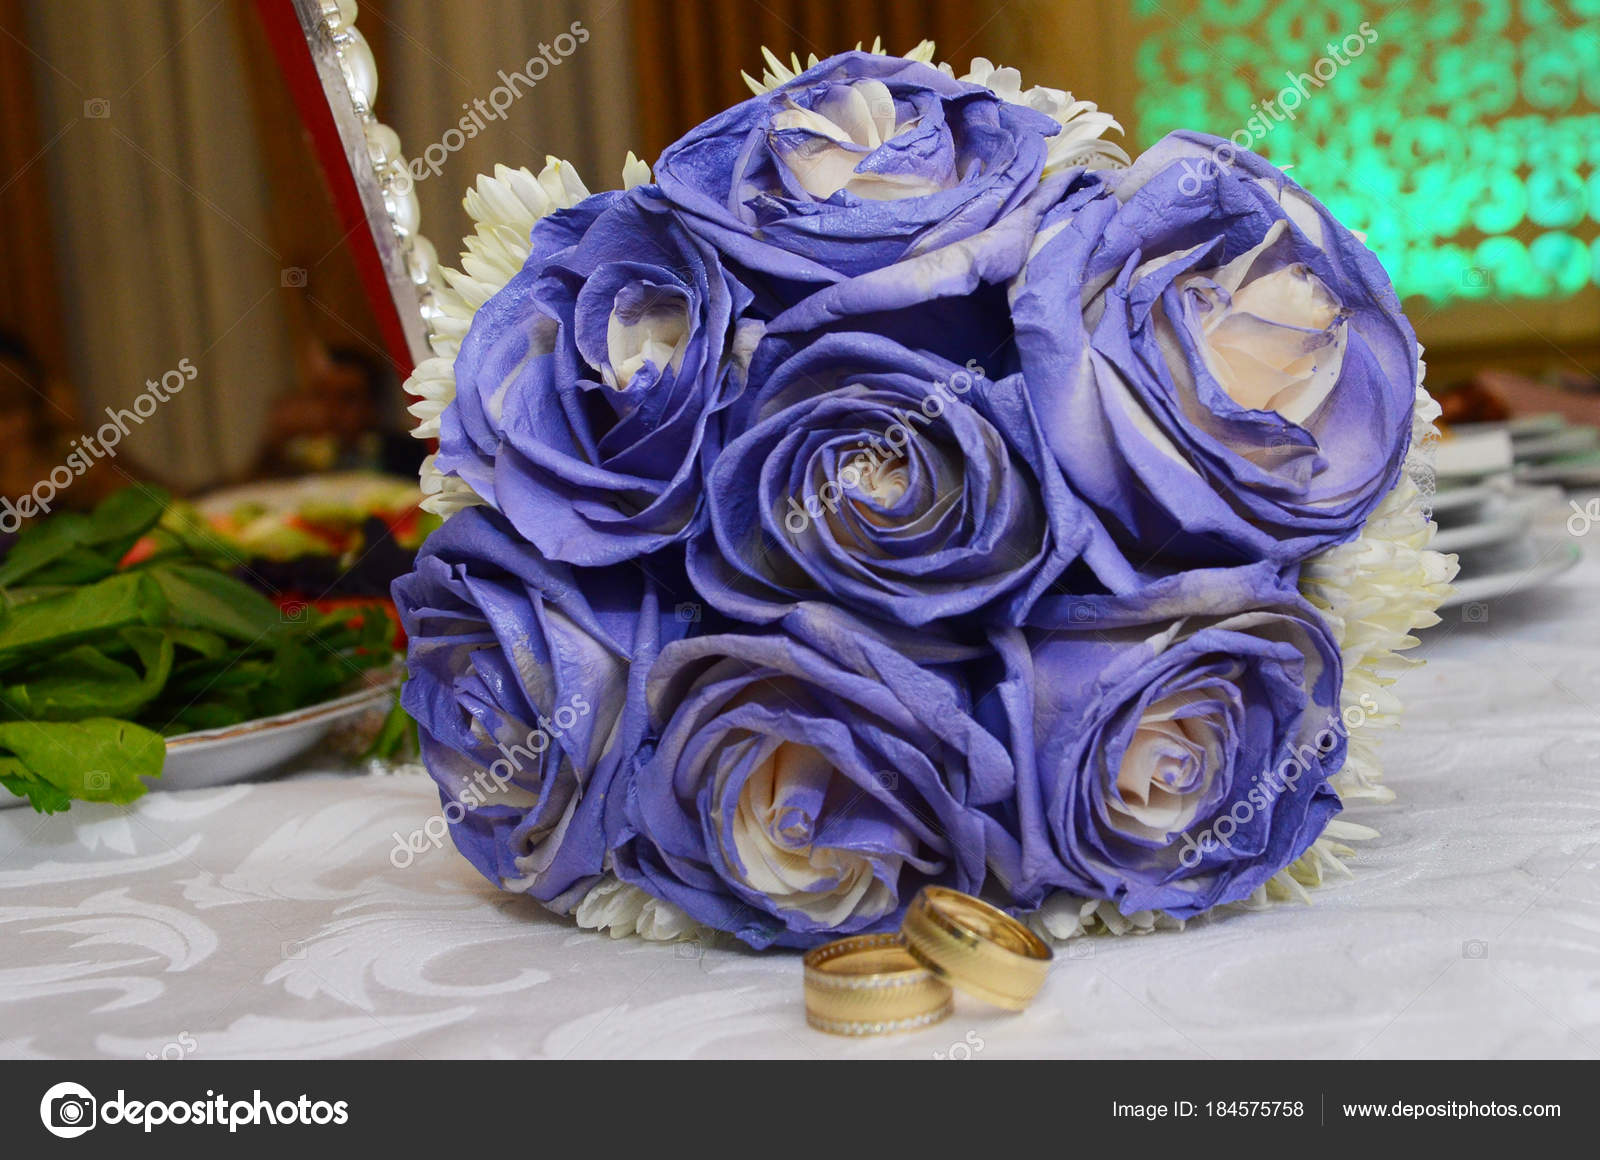 Blue wedding bouquet and rings beautiful blue and white fresh beautiful blue and white fresh flowers wedding bouquet photo by fotoqrafil izmirmasajfo